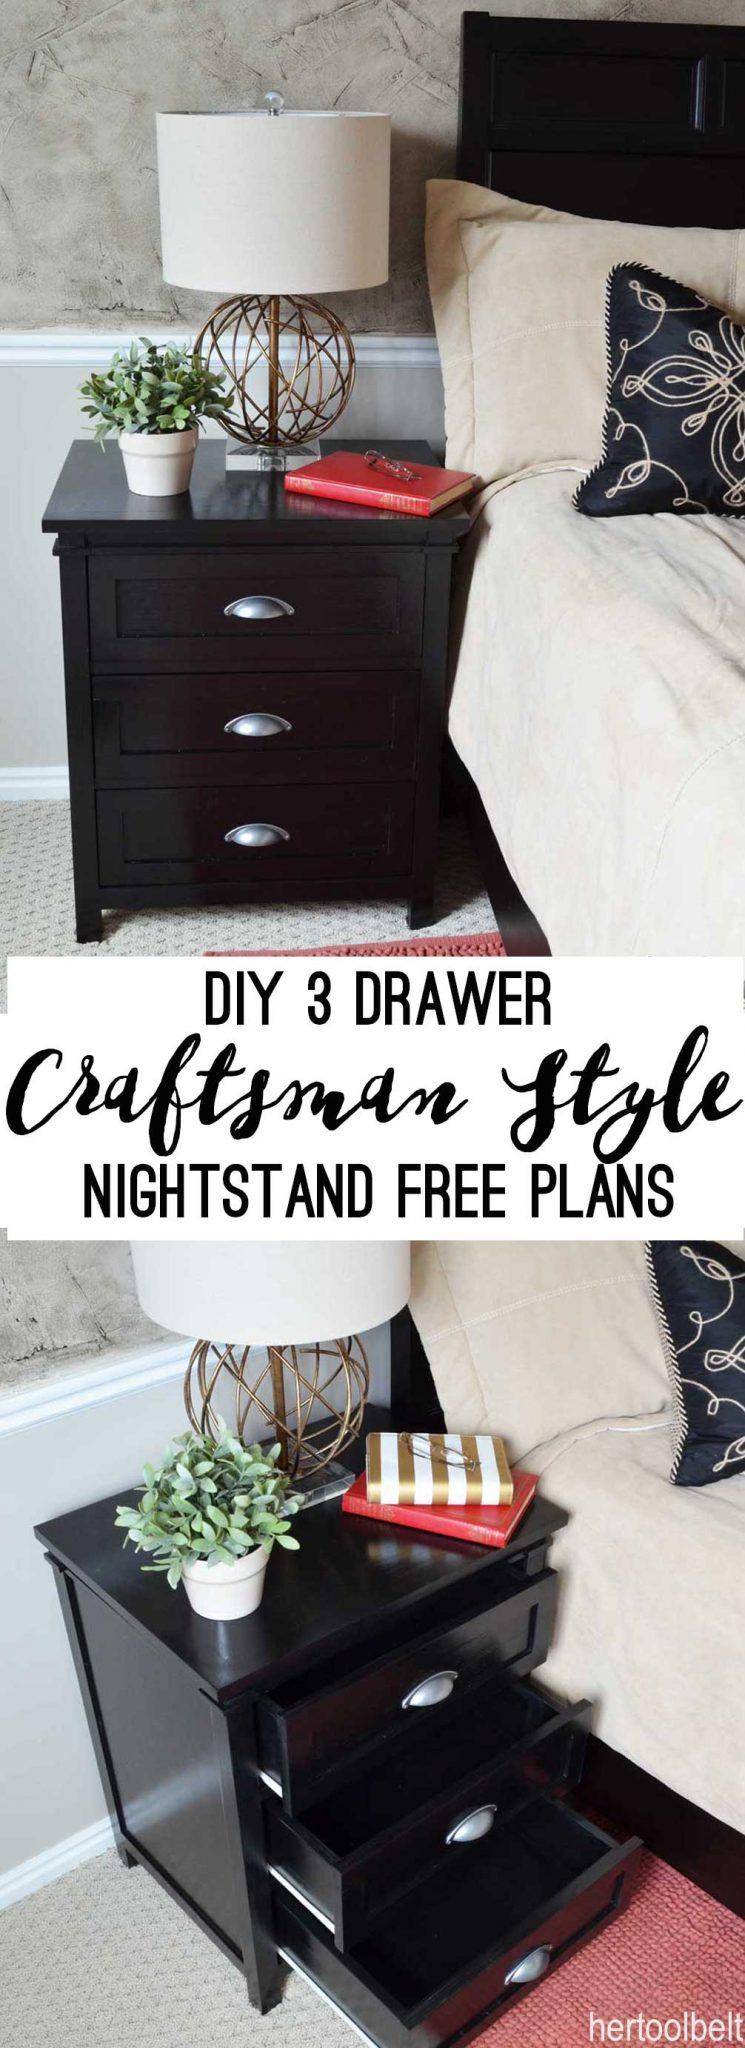 Diy Craftsman 3 Drawer Nightstand Her Tool Belt